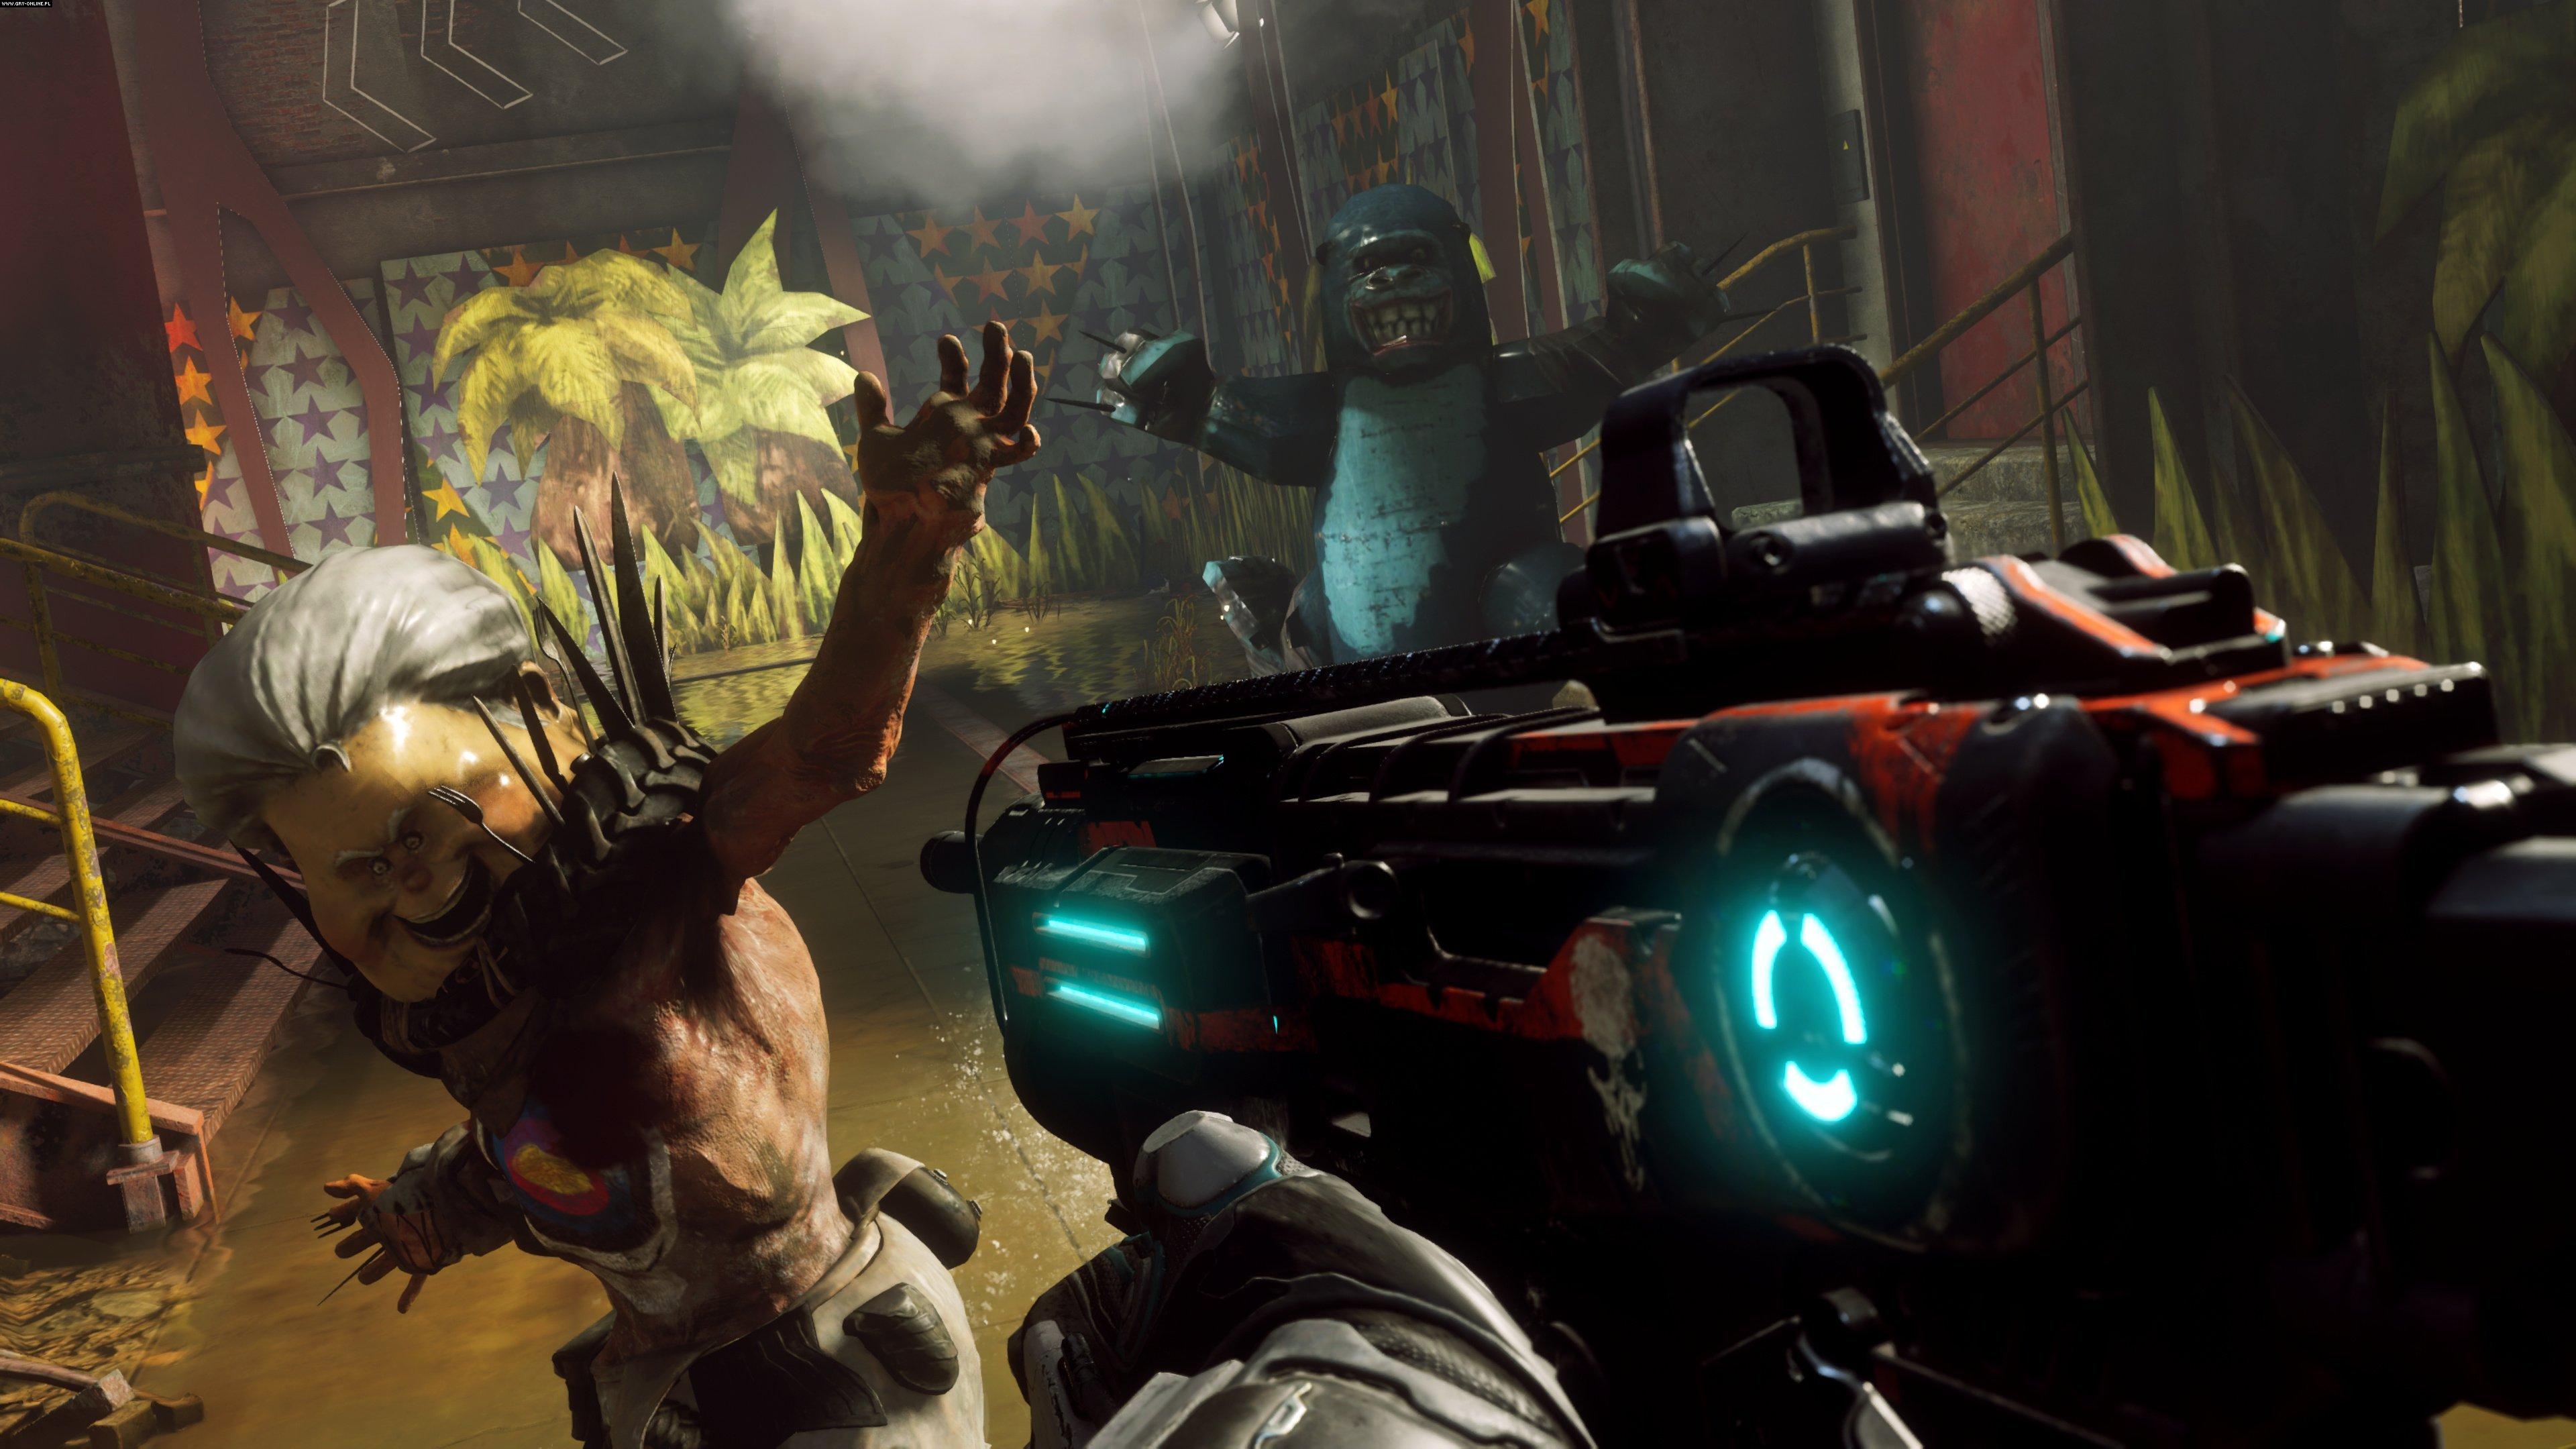 RAGE 2 PC, PS4, XONE Games Image 11/33, Avalanche Studios, Bethesda Softworks